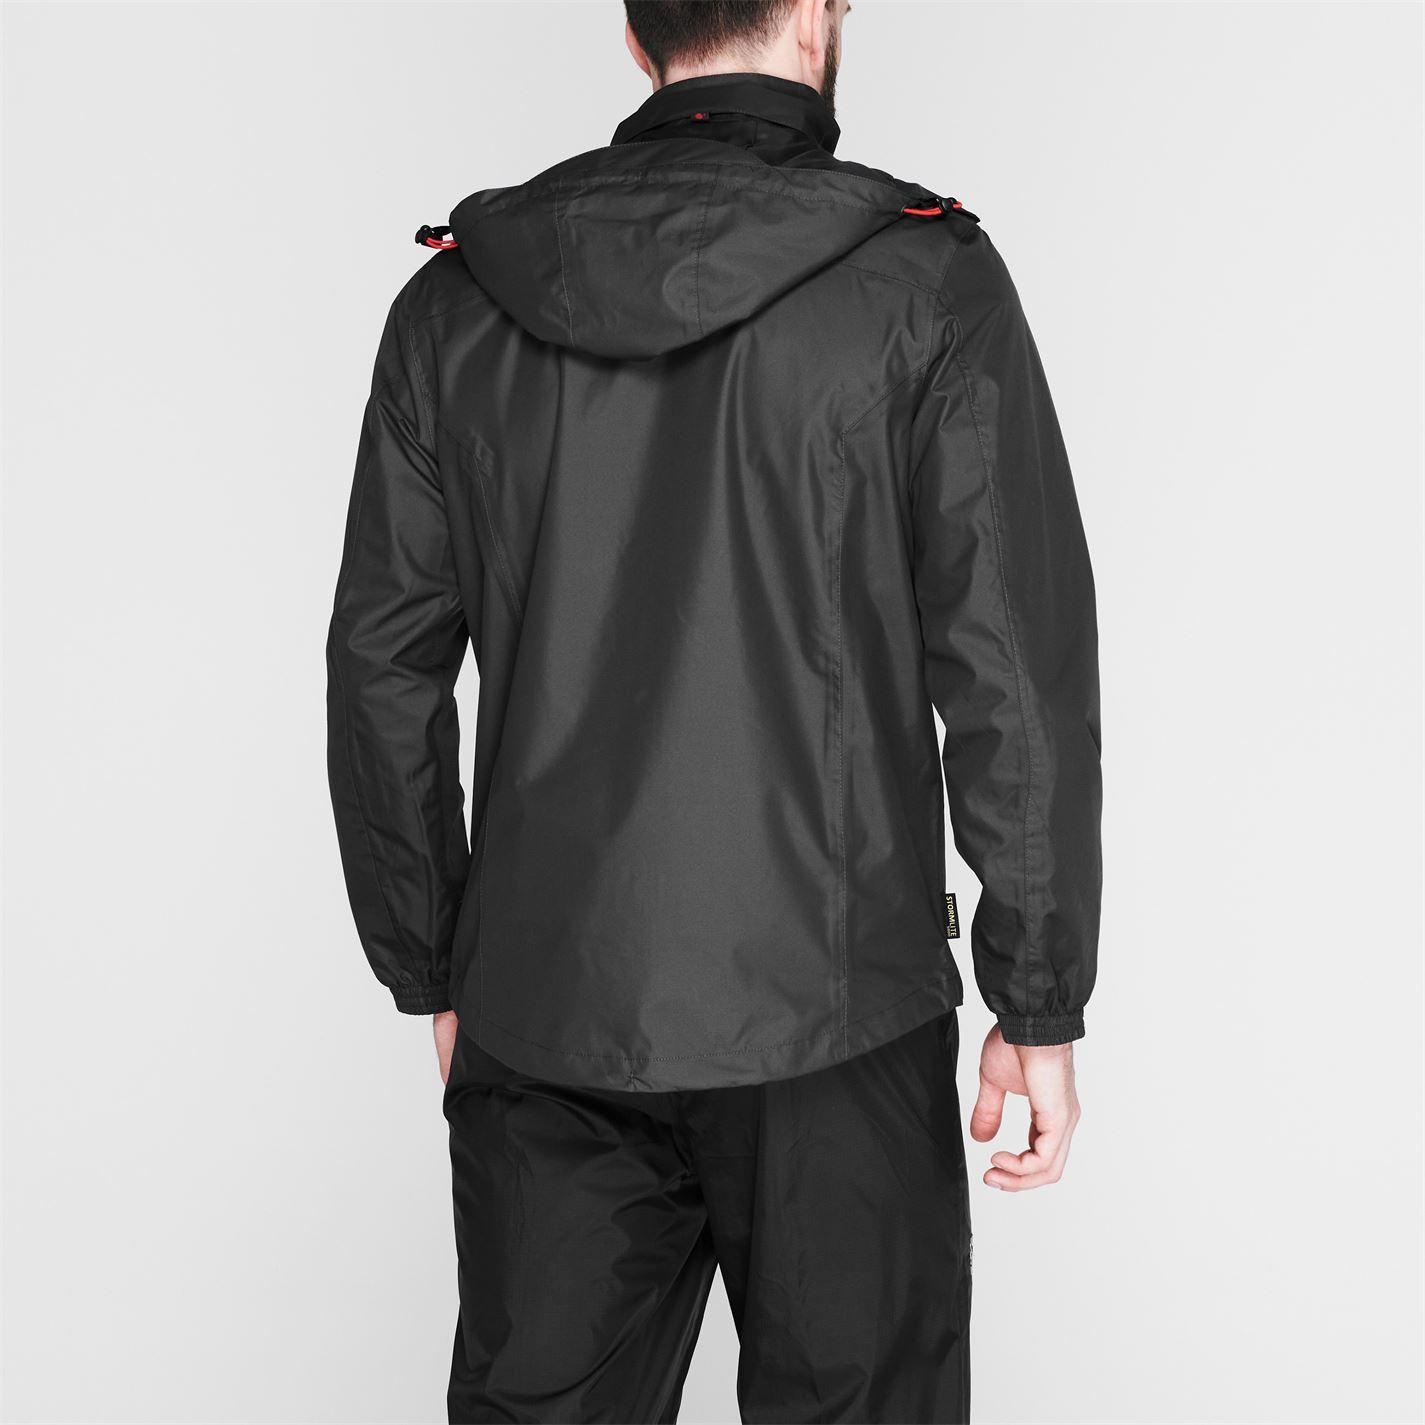 Gelert Mens Horizon Waterproof Jacket Coat Top Chin Guard Breathable Hooded Zip